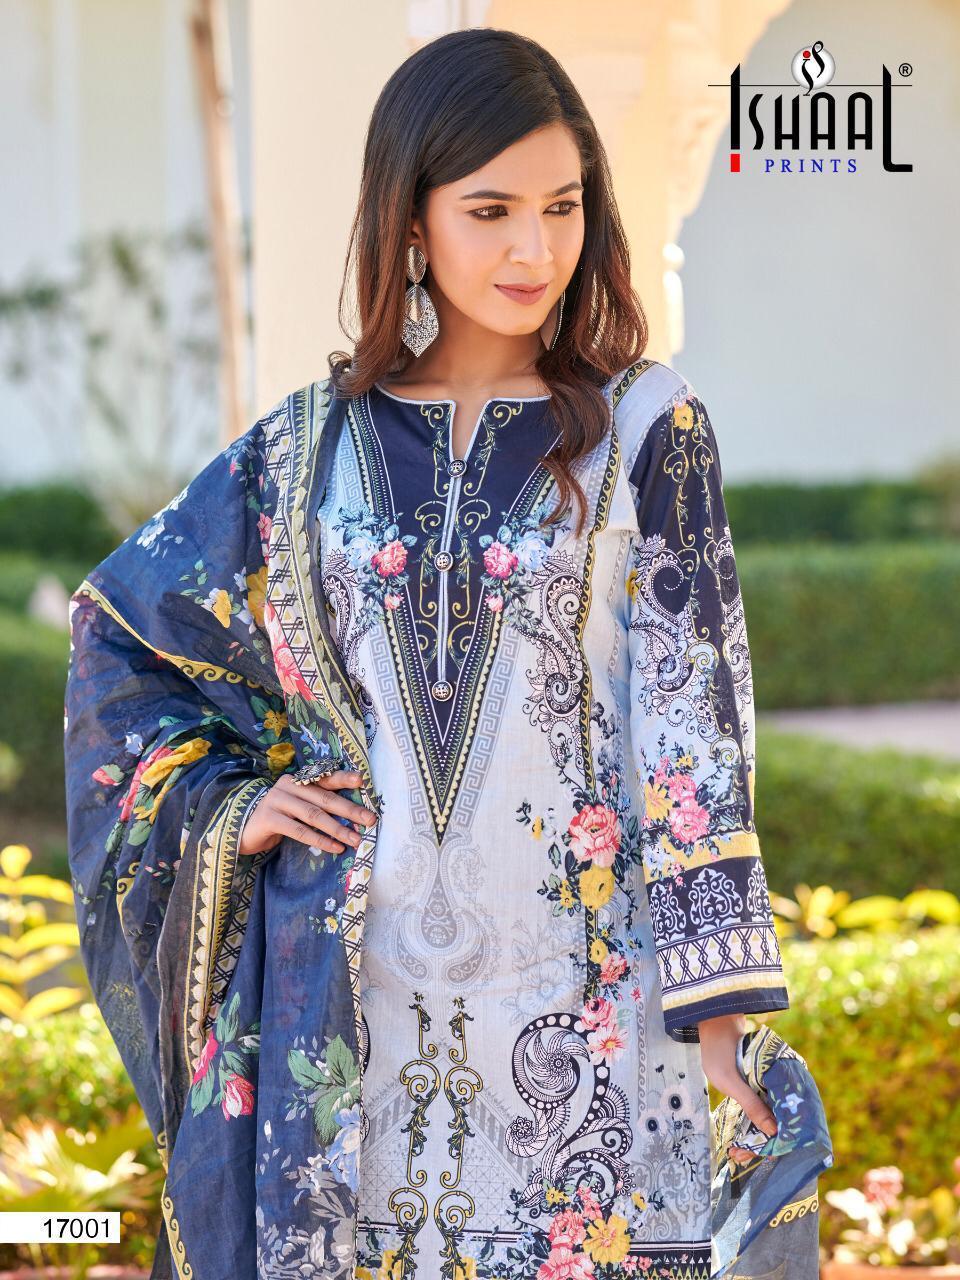 Ishaal Gulmohar Vol 17 Salwar Suit Wholesale Catalog 10 Pcs 7 - Ishaal Gulmohar Vol 17 Salwar Suit Wholesale Catalog 10 Pcs